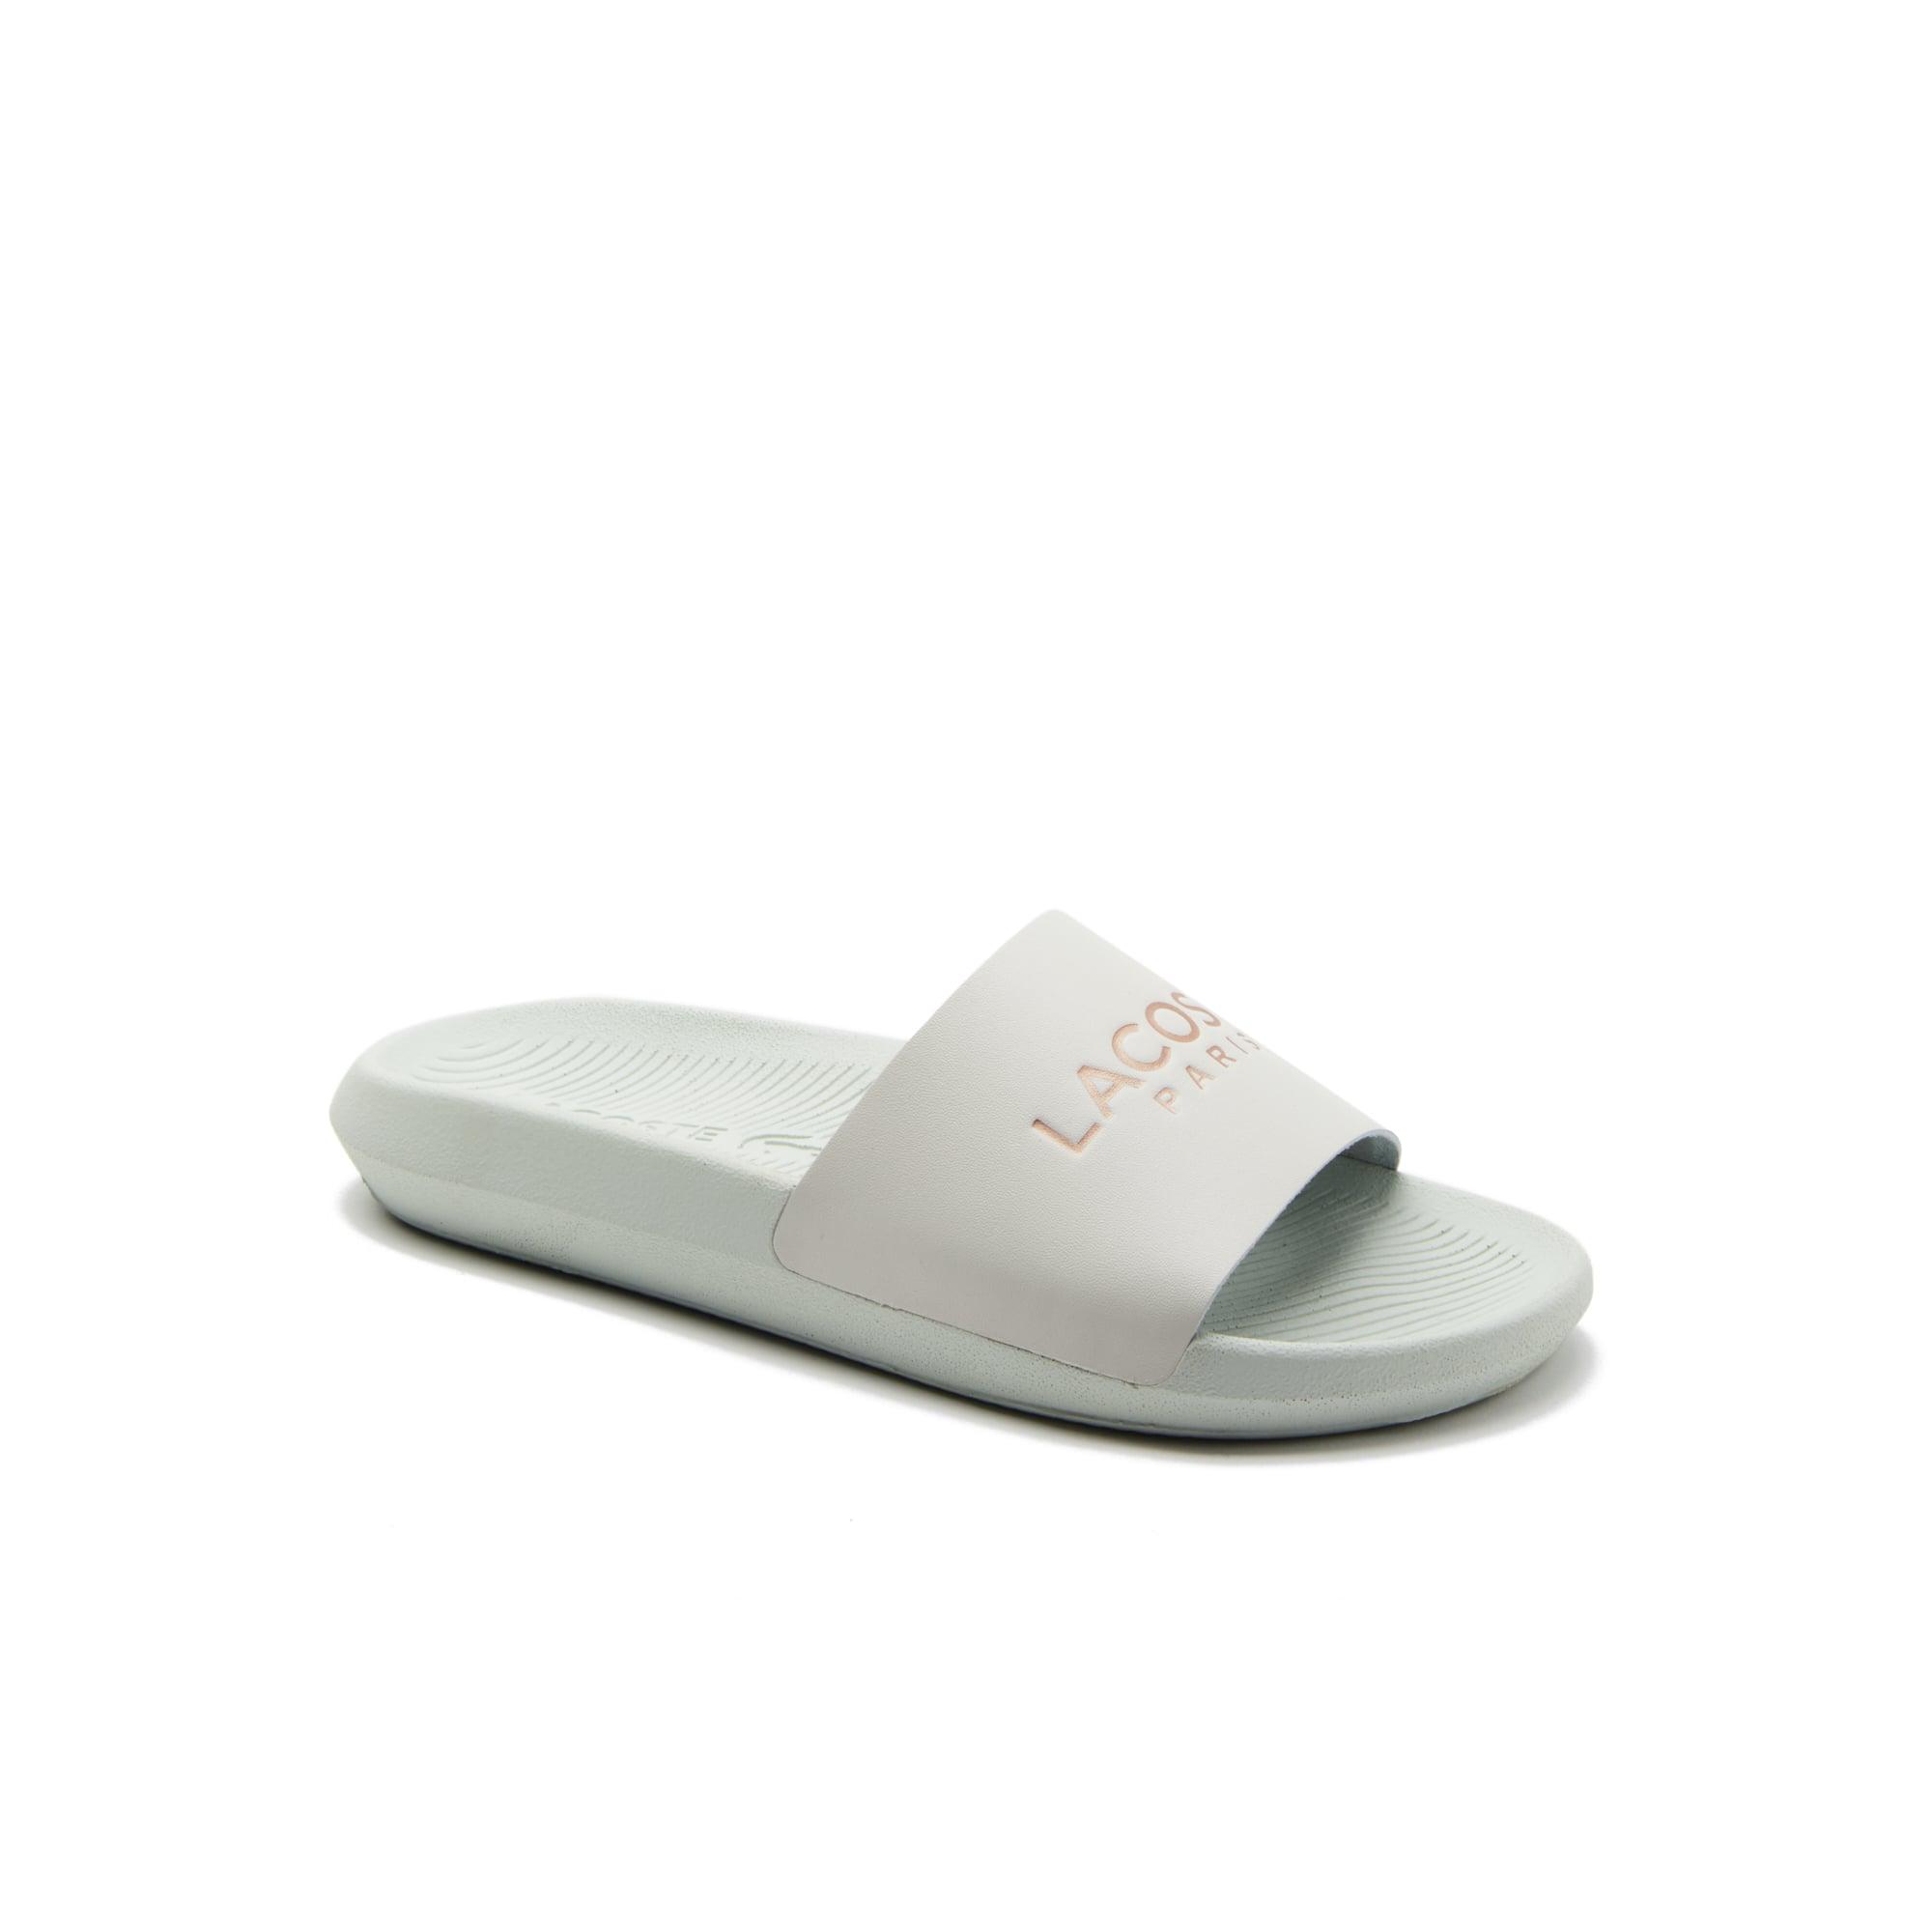 62437d475c Shoes for Women | Footwear | LACOSTE